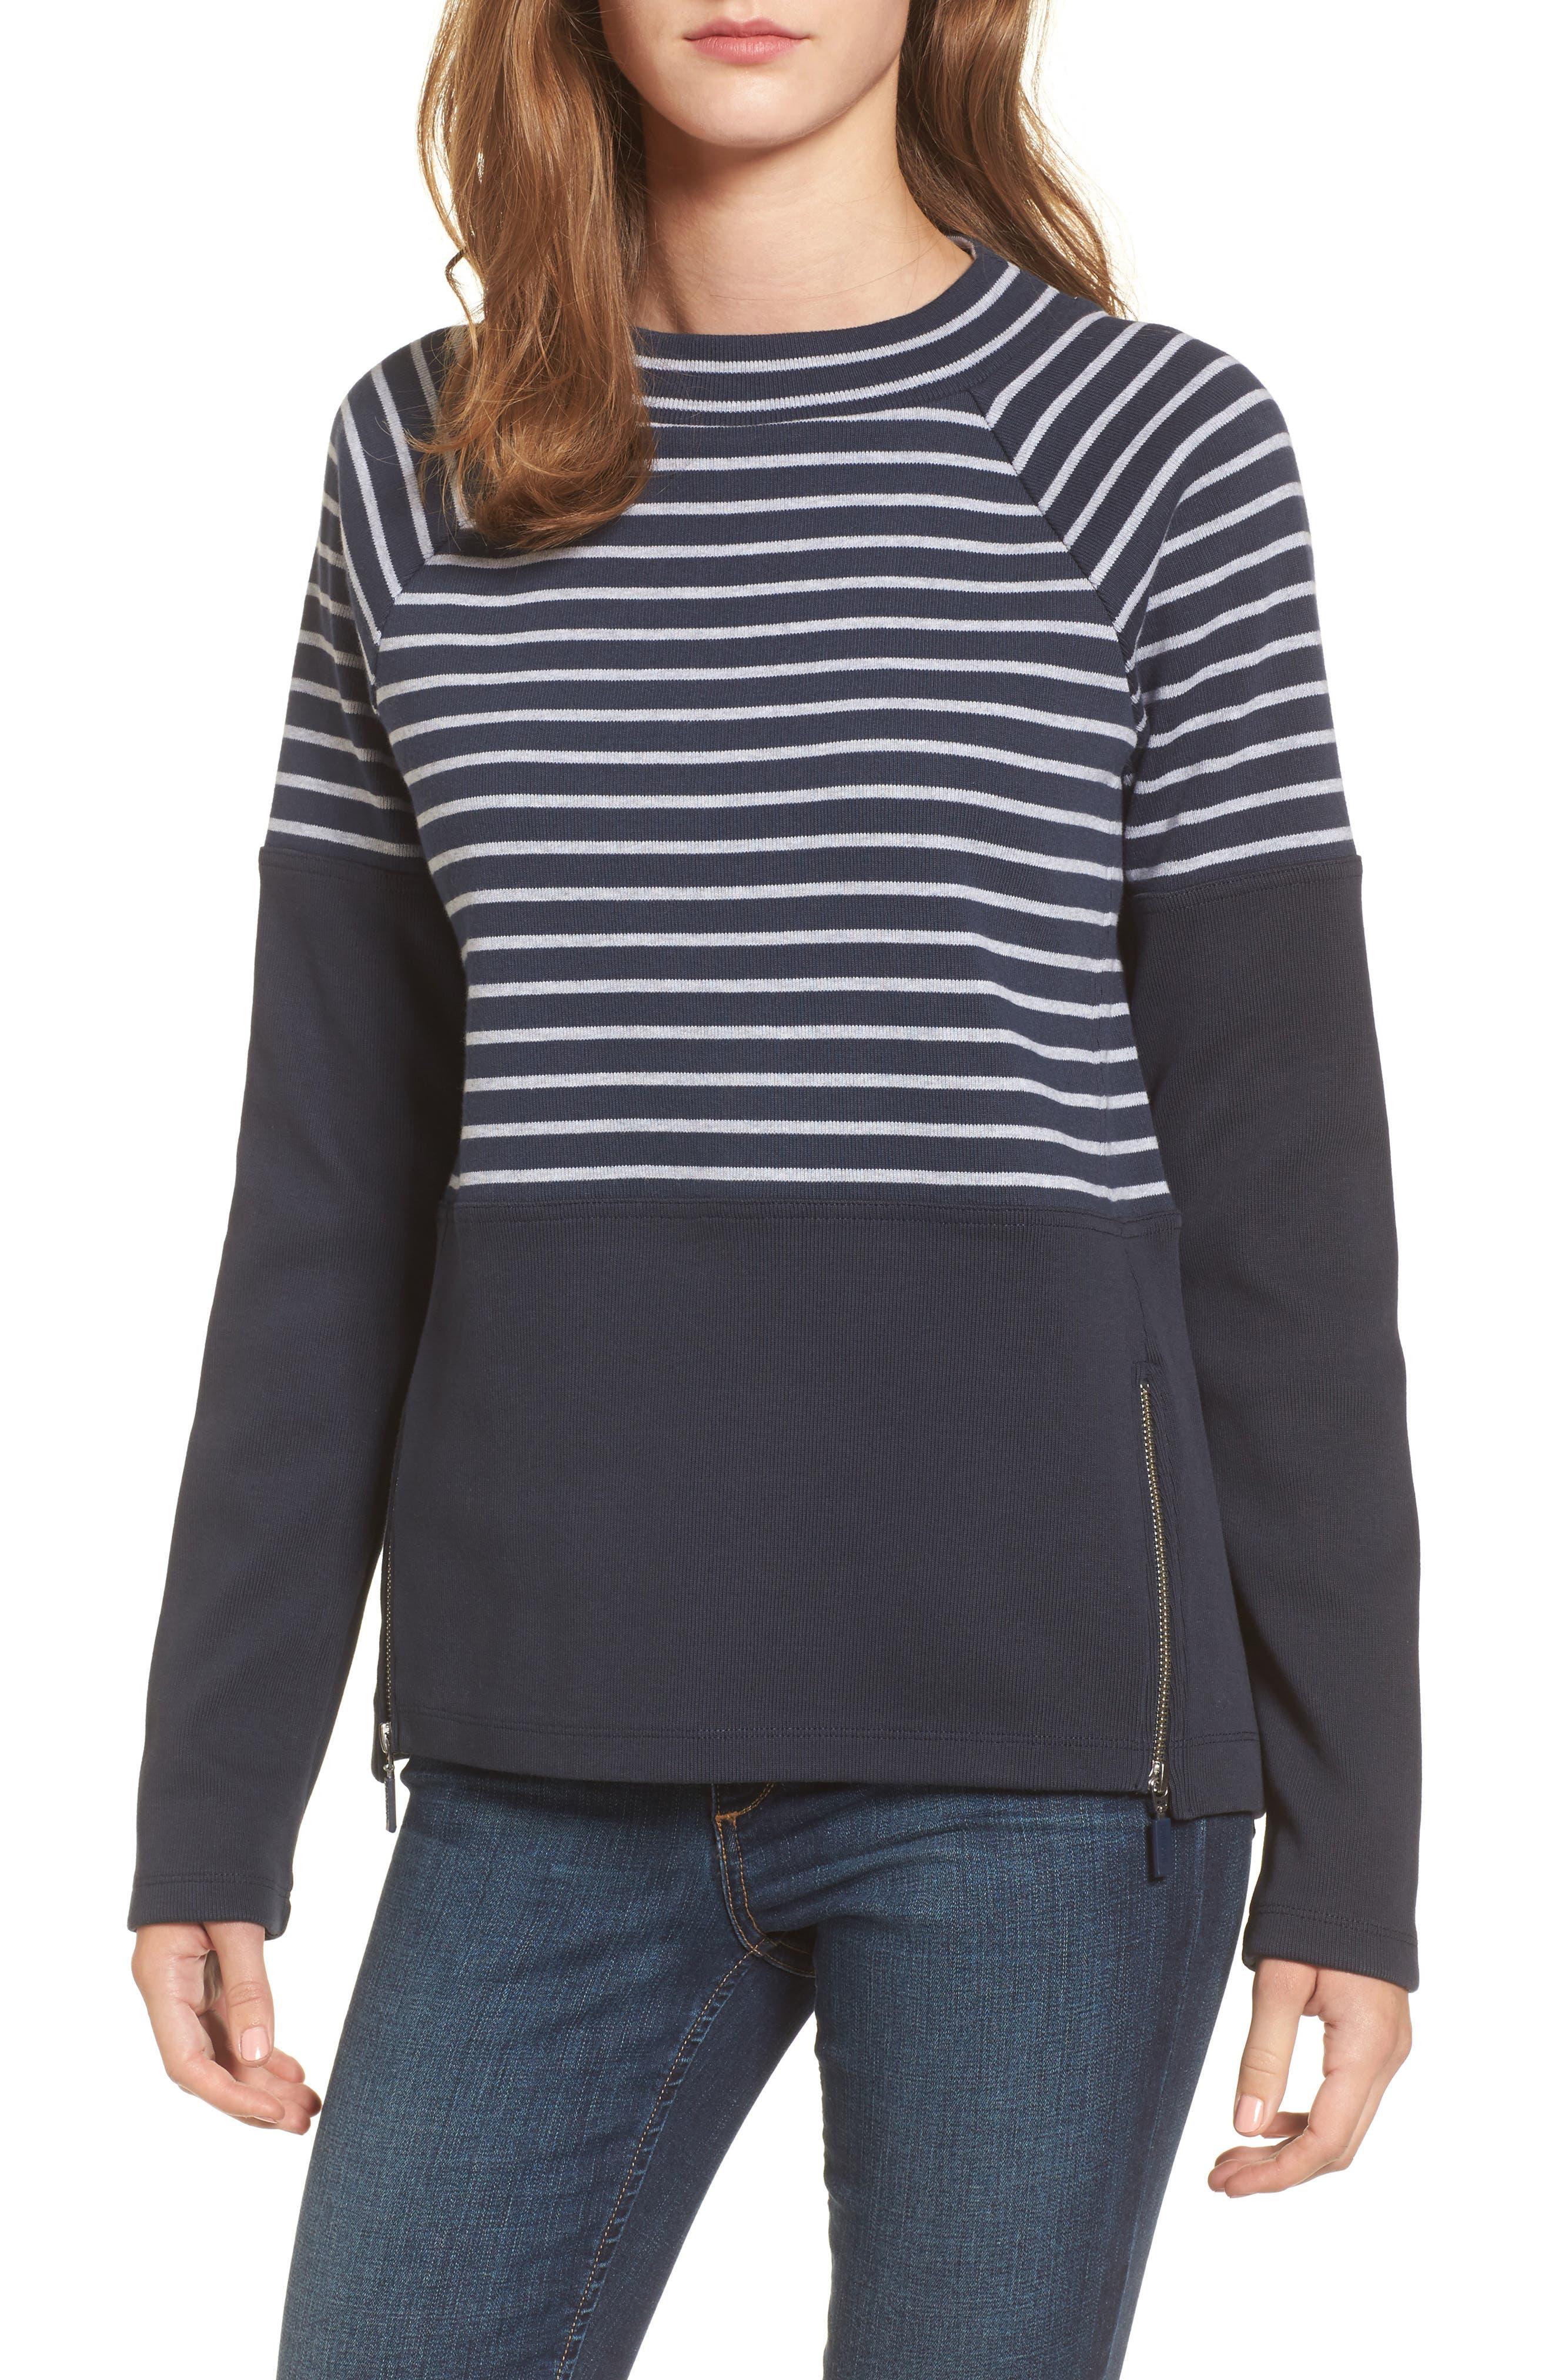 Seaburn Stripe Sweatshirt,                             Main thumbnail 1, color,                             Navy/ Grey